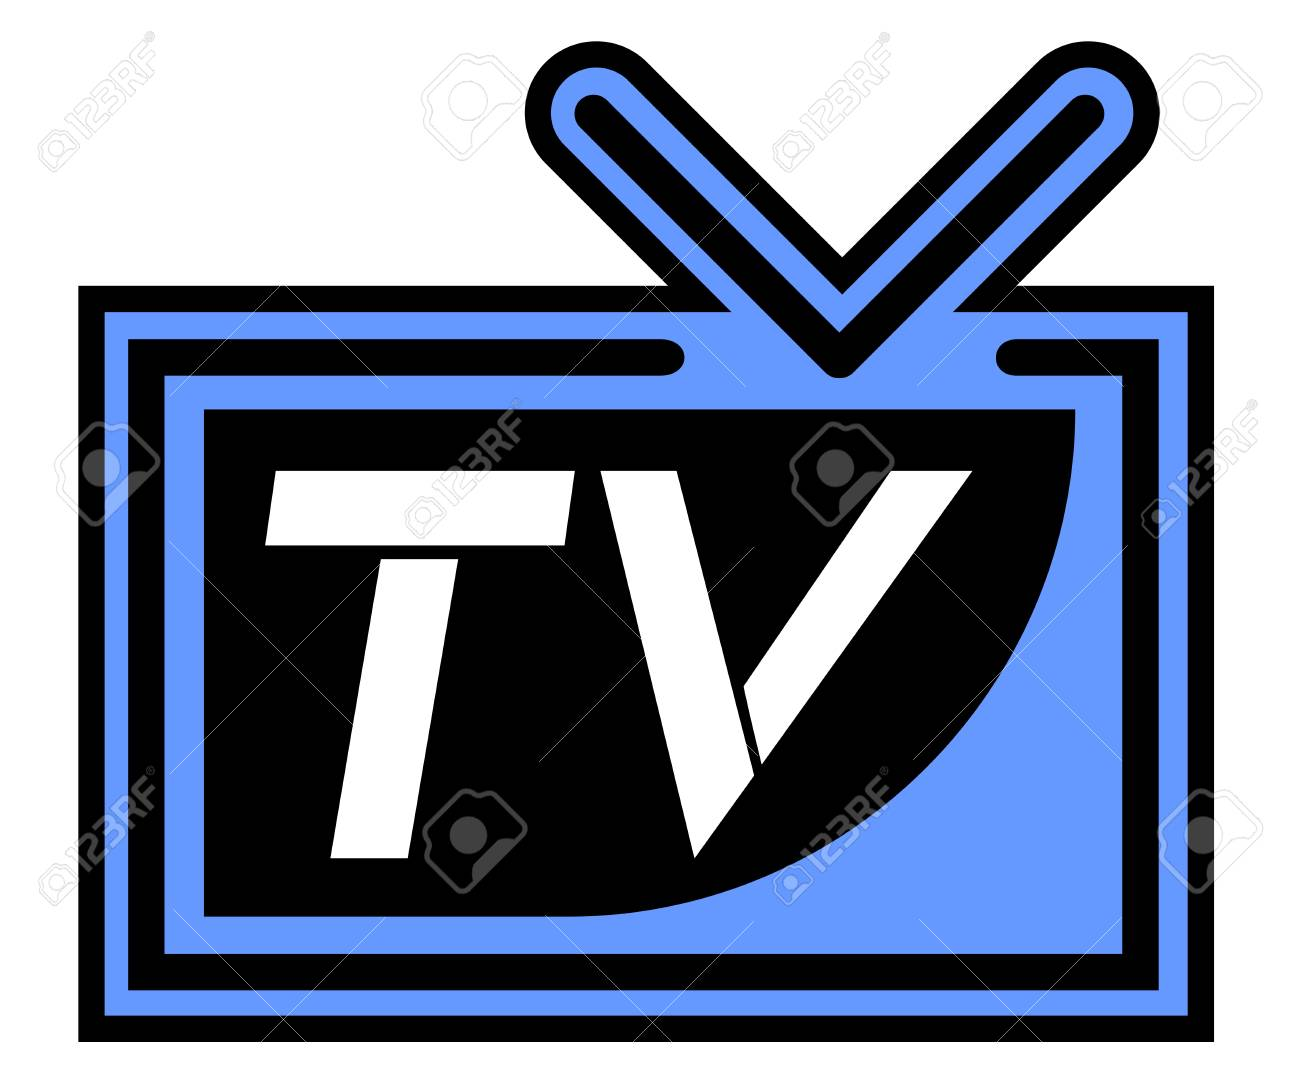 Television symbol Stock Vector - 17902497